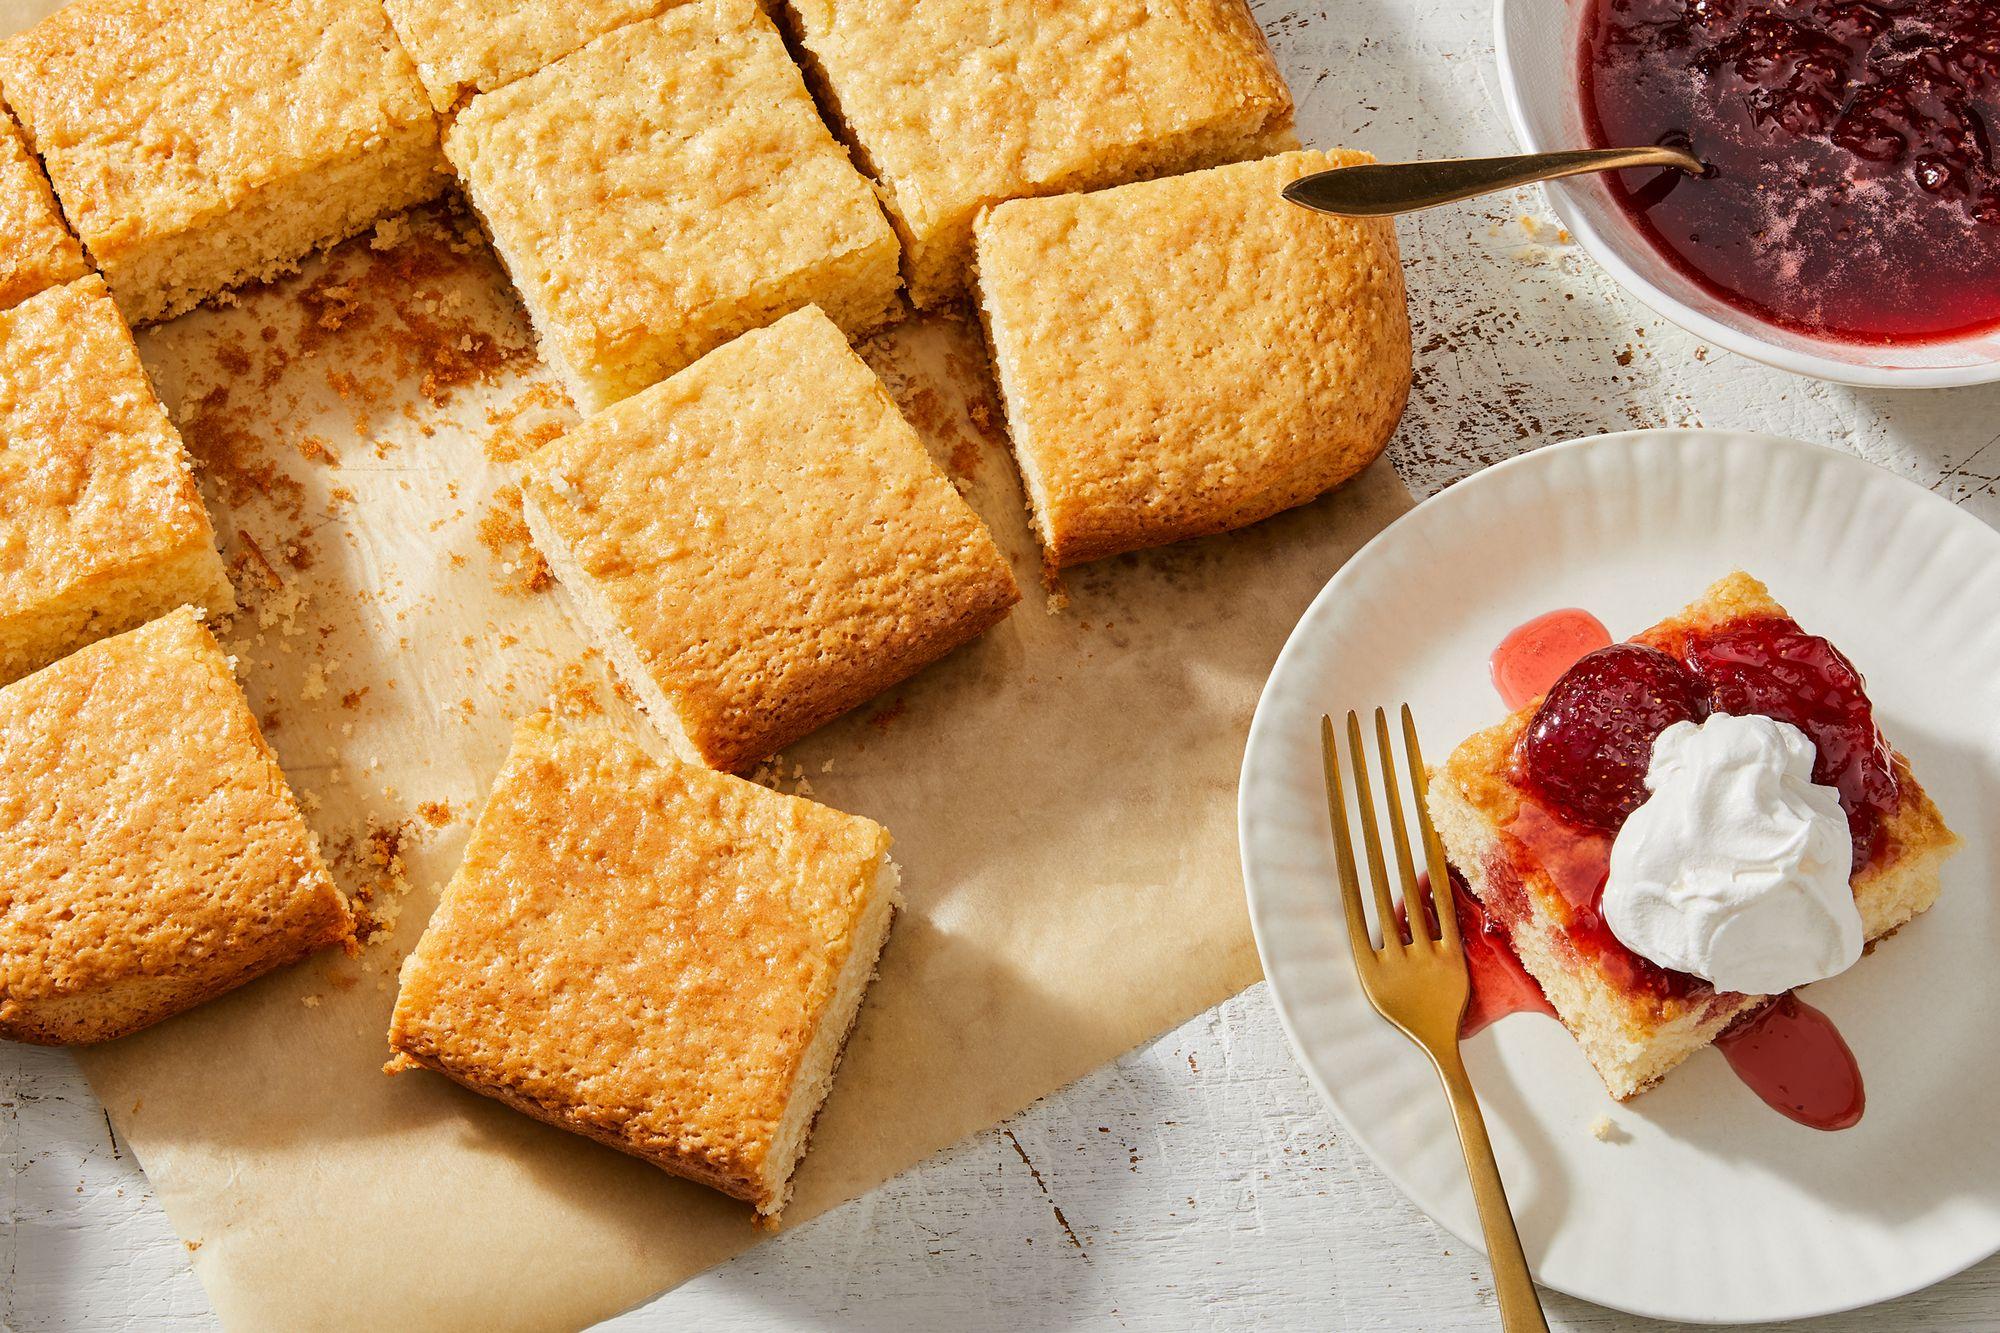 The Simplest Stir-and-Bake Vanilla Cake